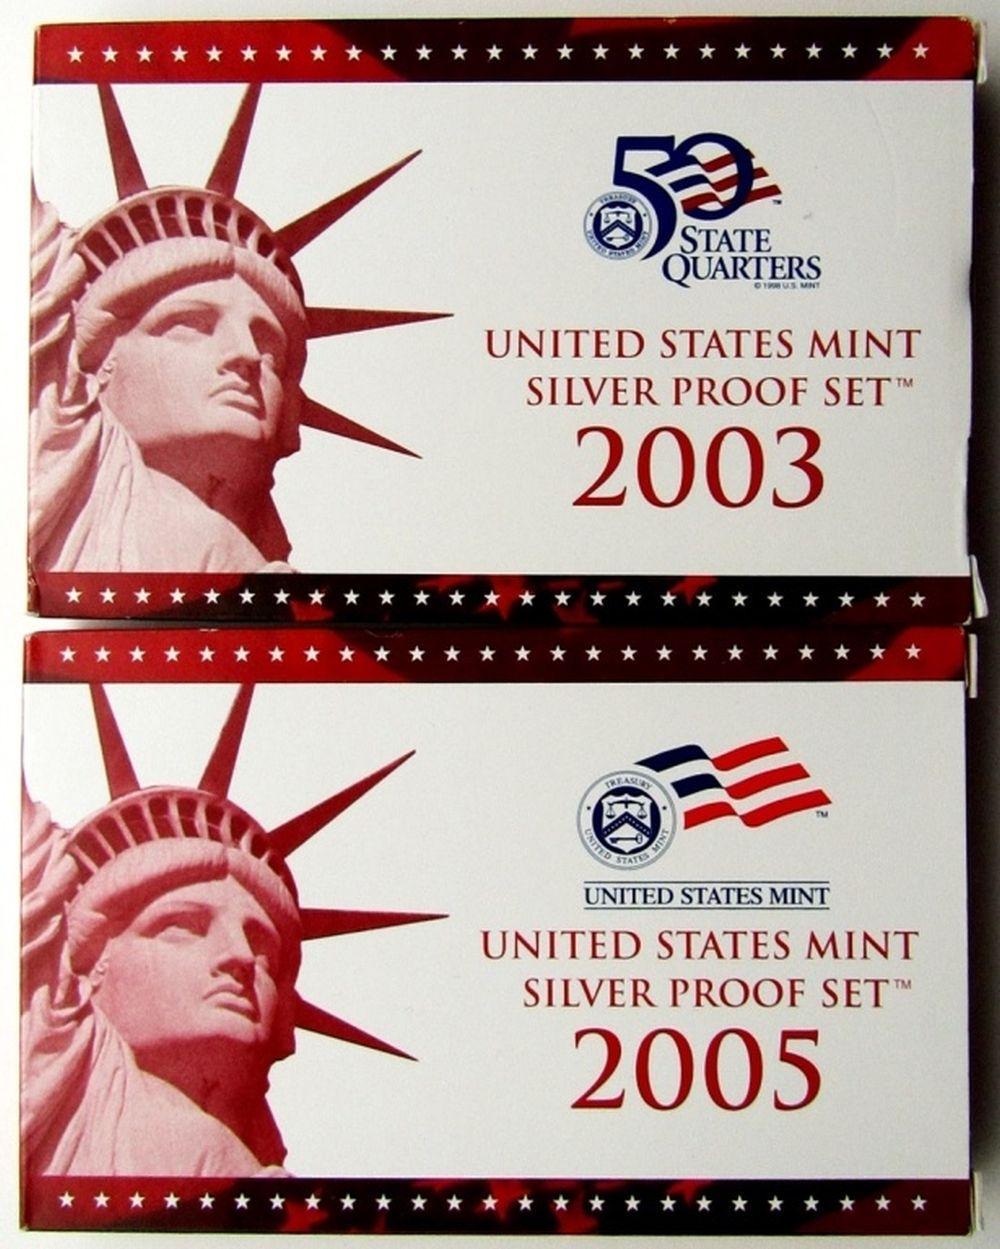 Lot 194: 2003 & 2005 U.S. MINT SILVER PROOF SETS